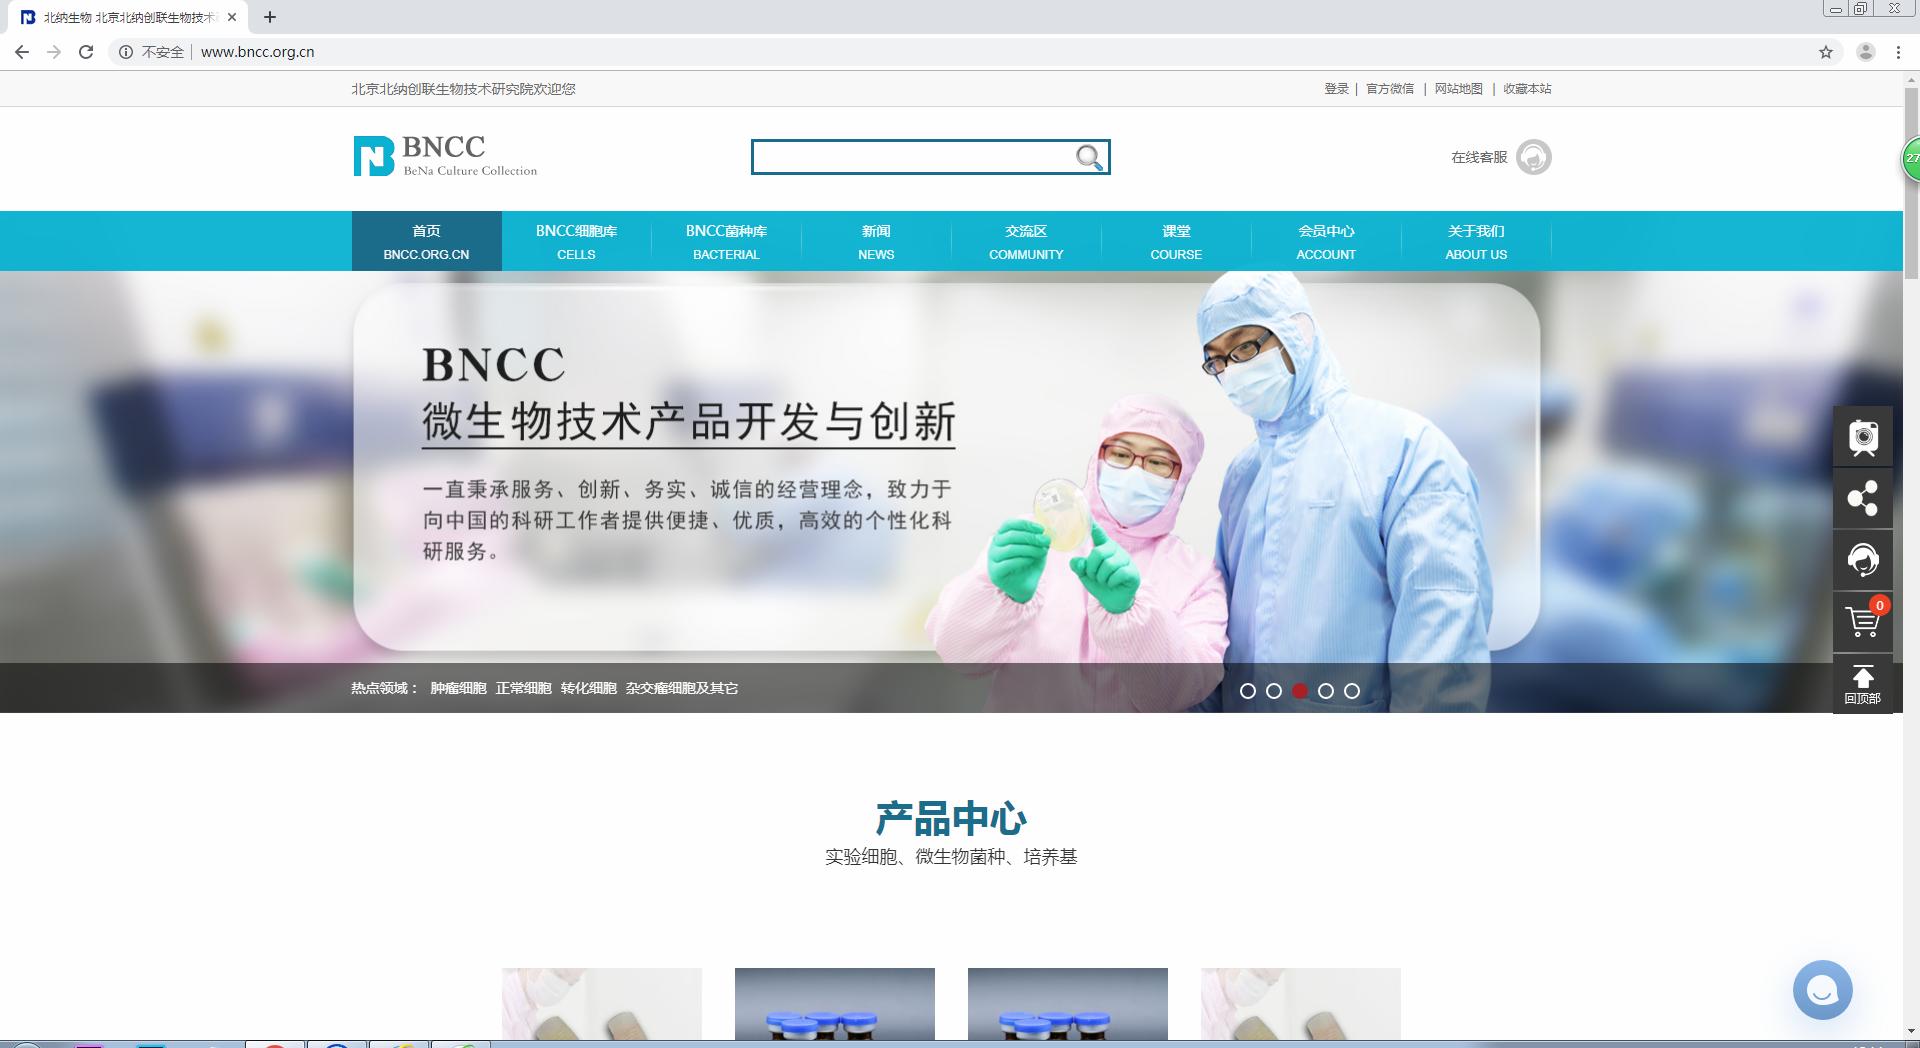 BNCC网站全新改版-www.bncc.org.cn北纳生物